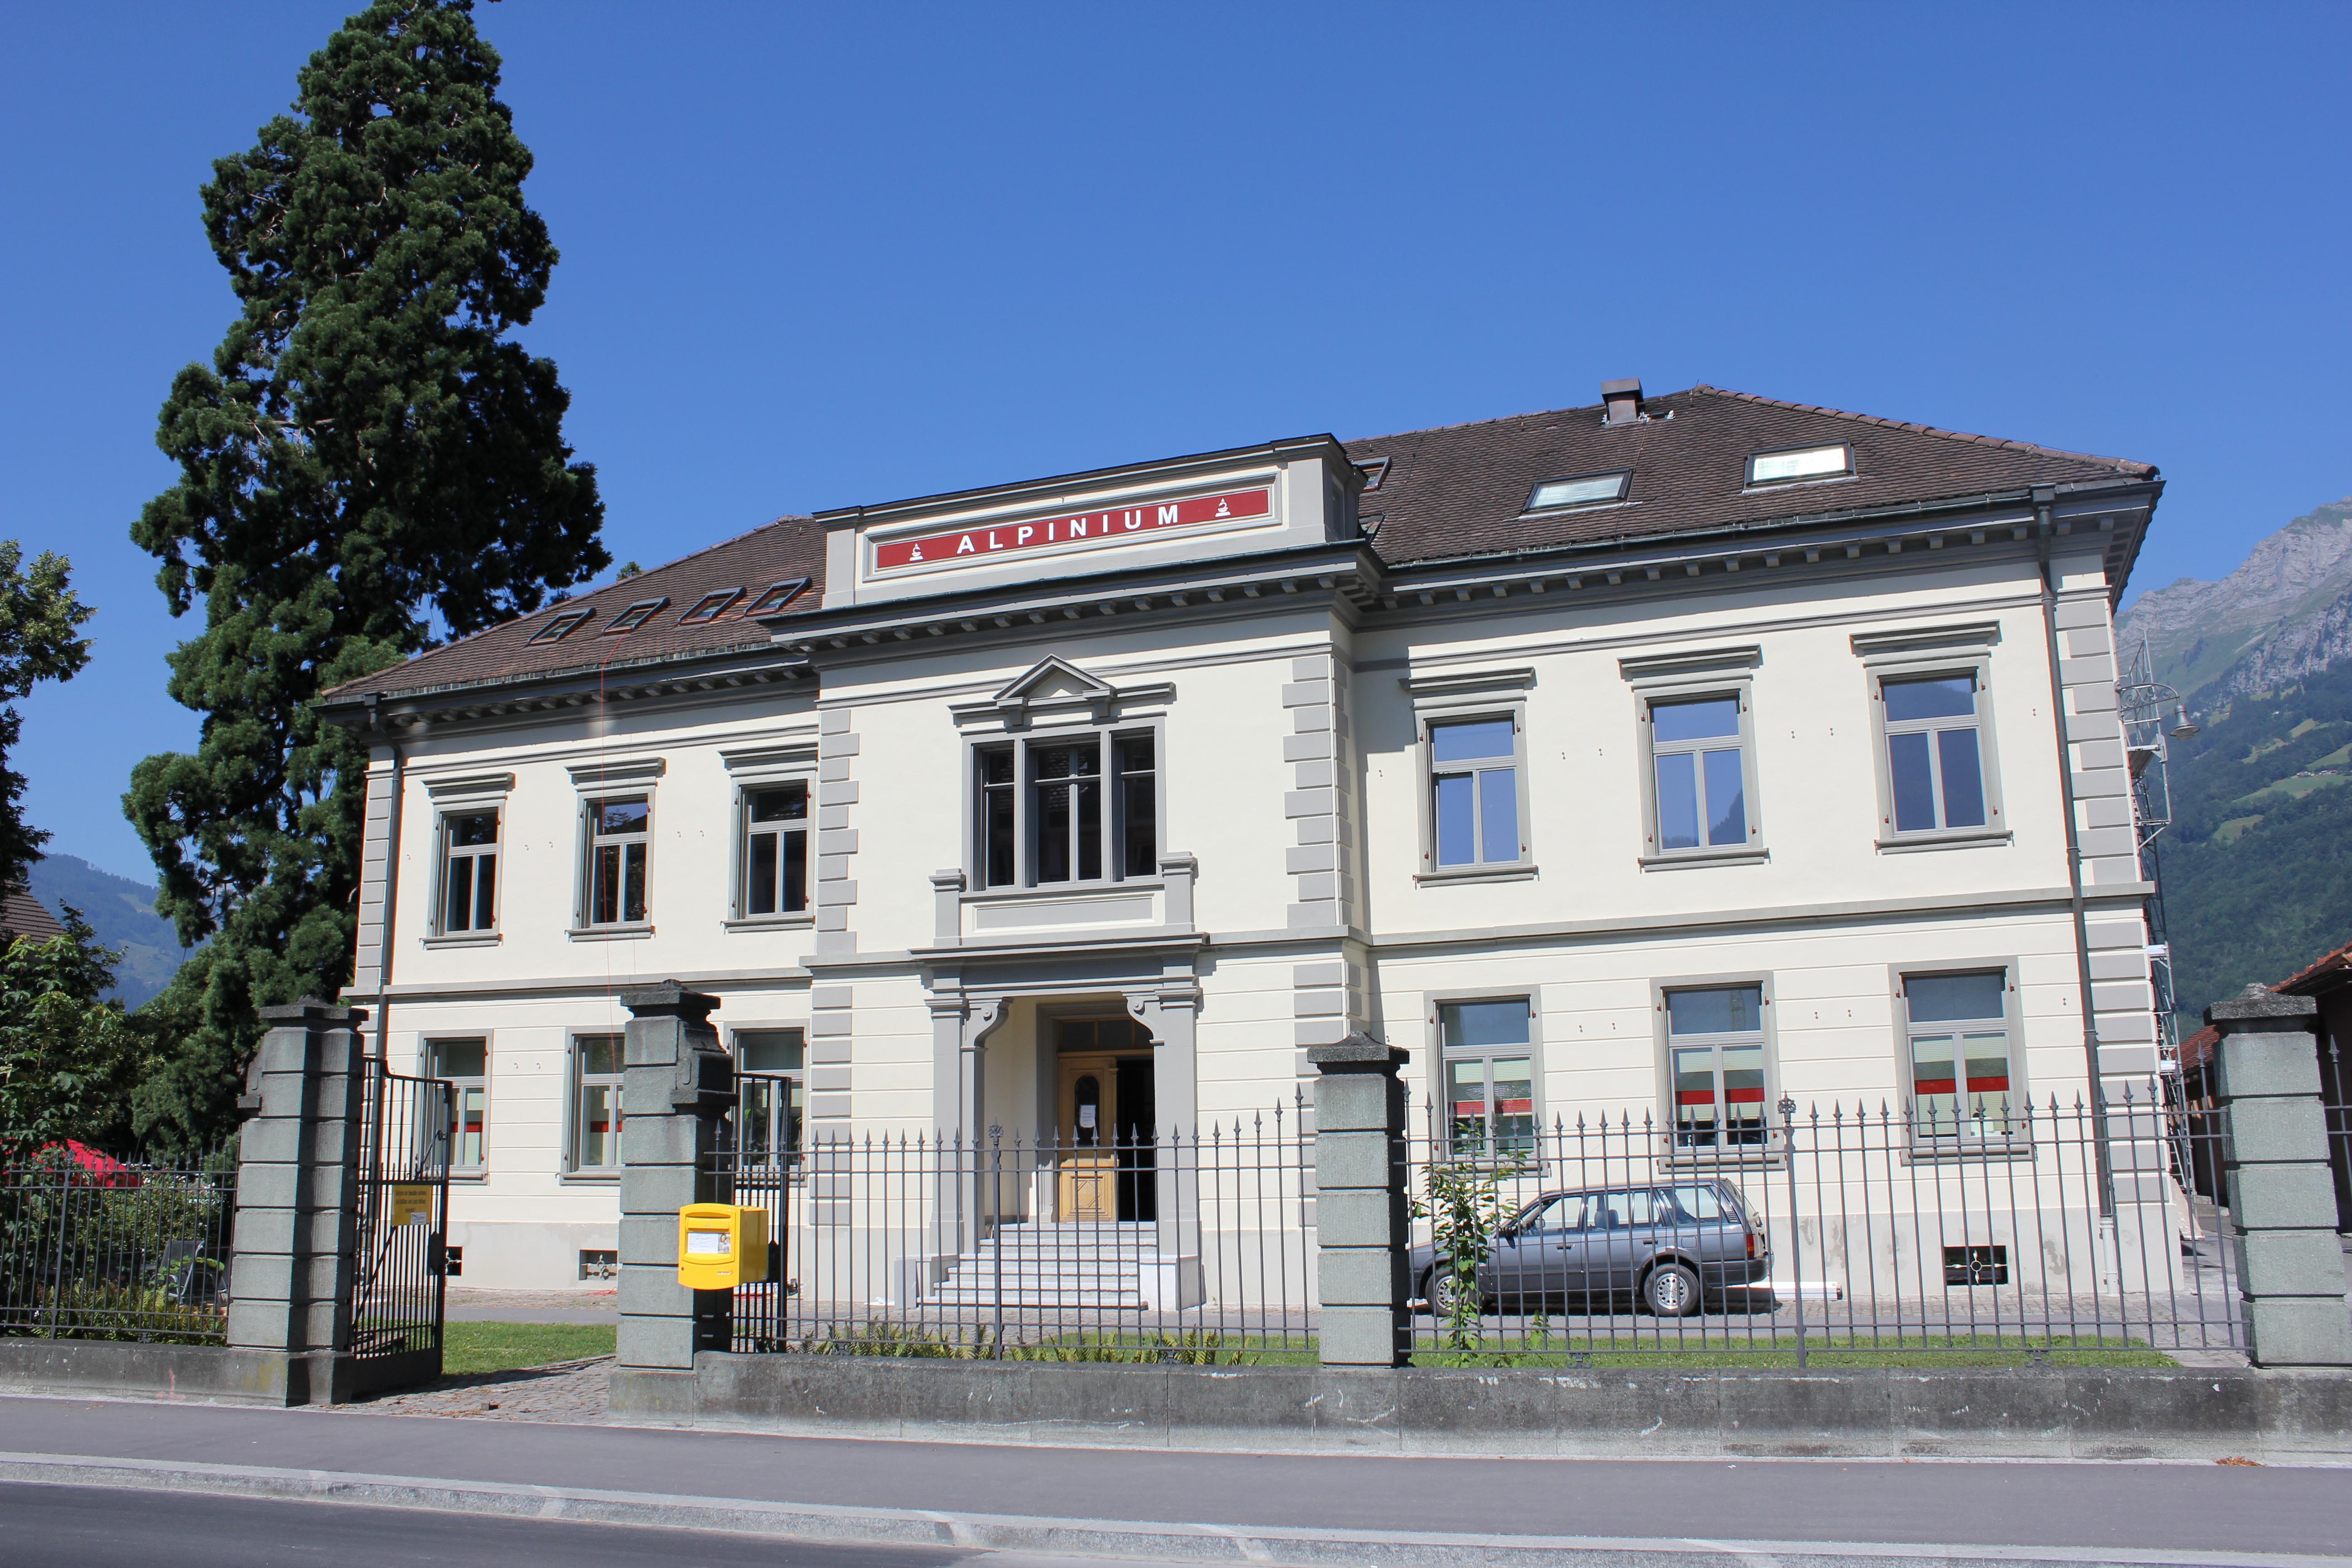 file alpinium walenstadt st gallen switzerland wikimedia commons. Black Bedroom Furniture Sets. Home Design Ideas